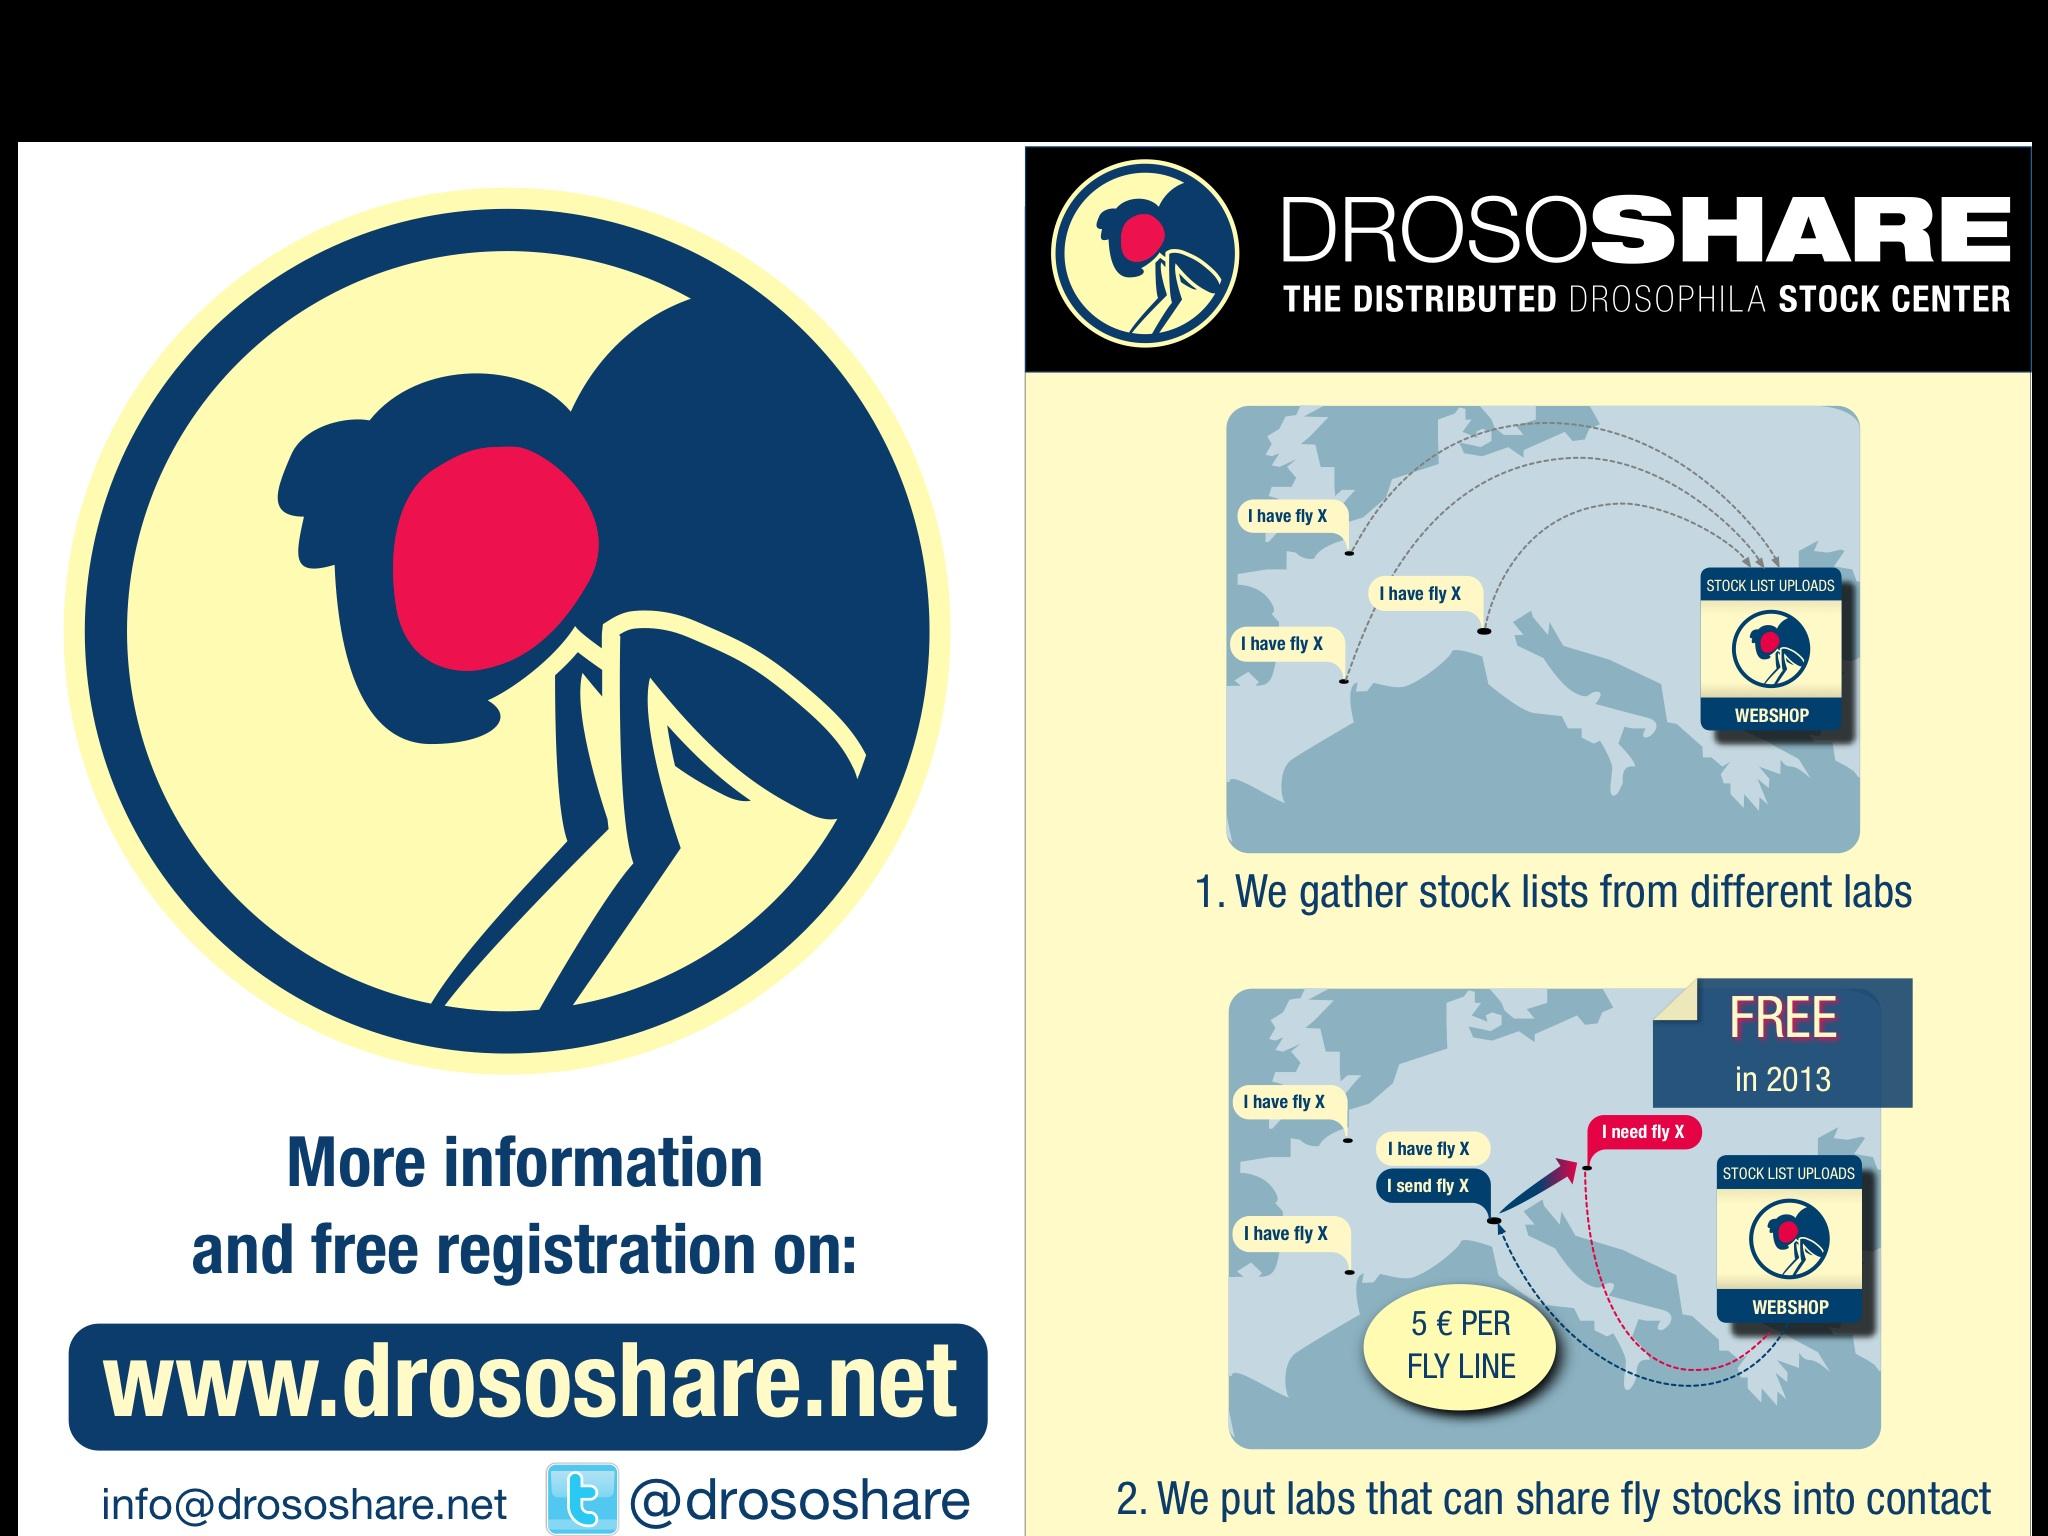 Drososhare (Source)